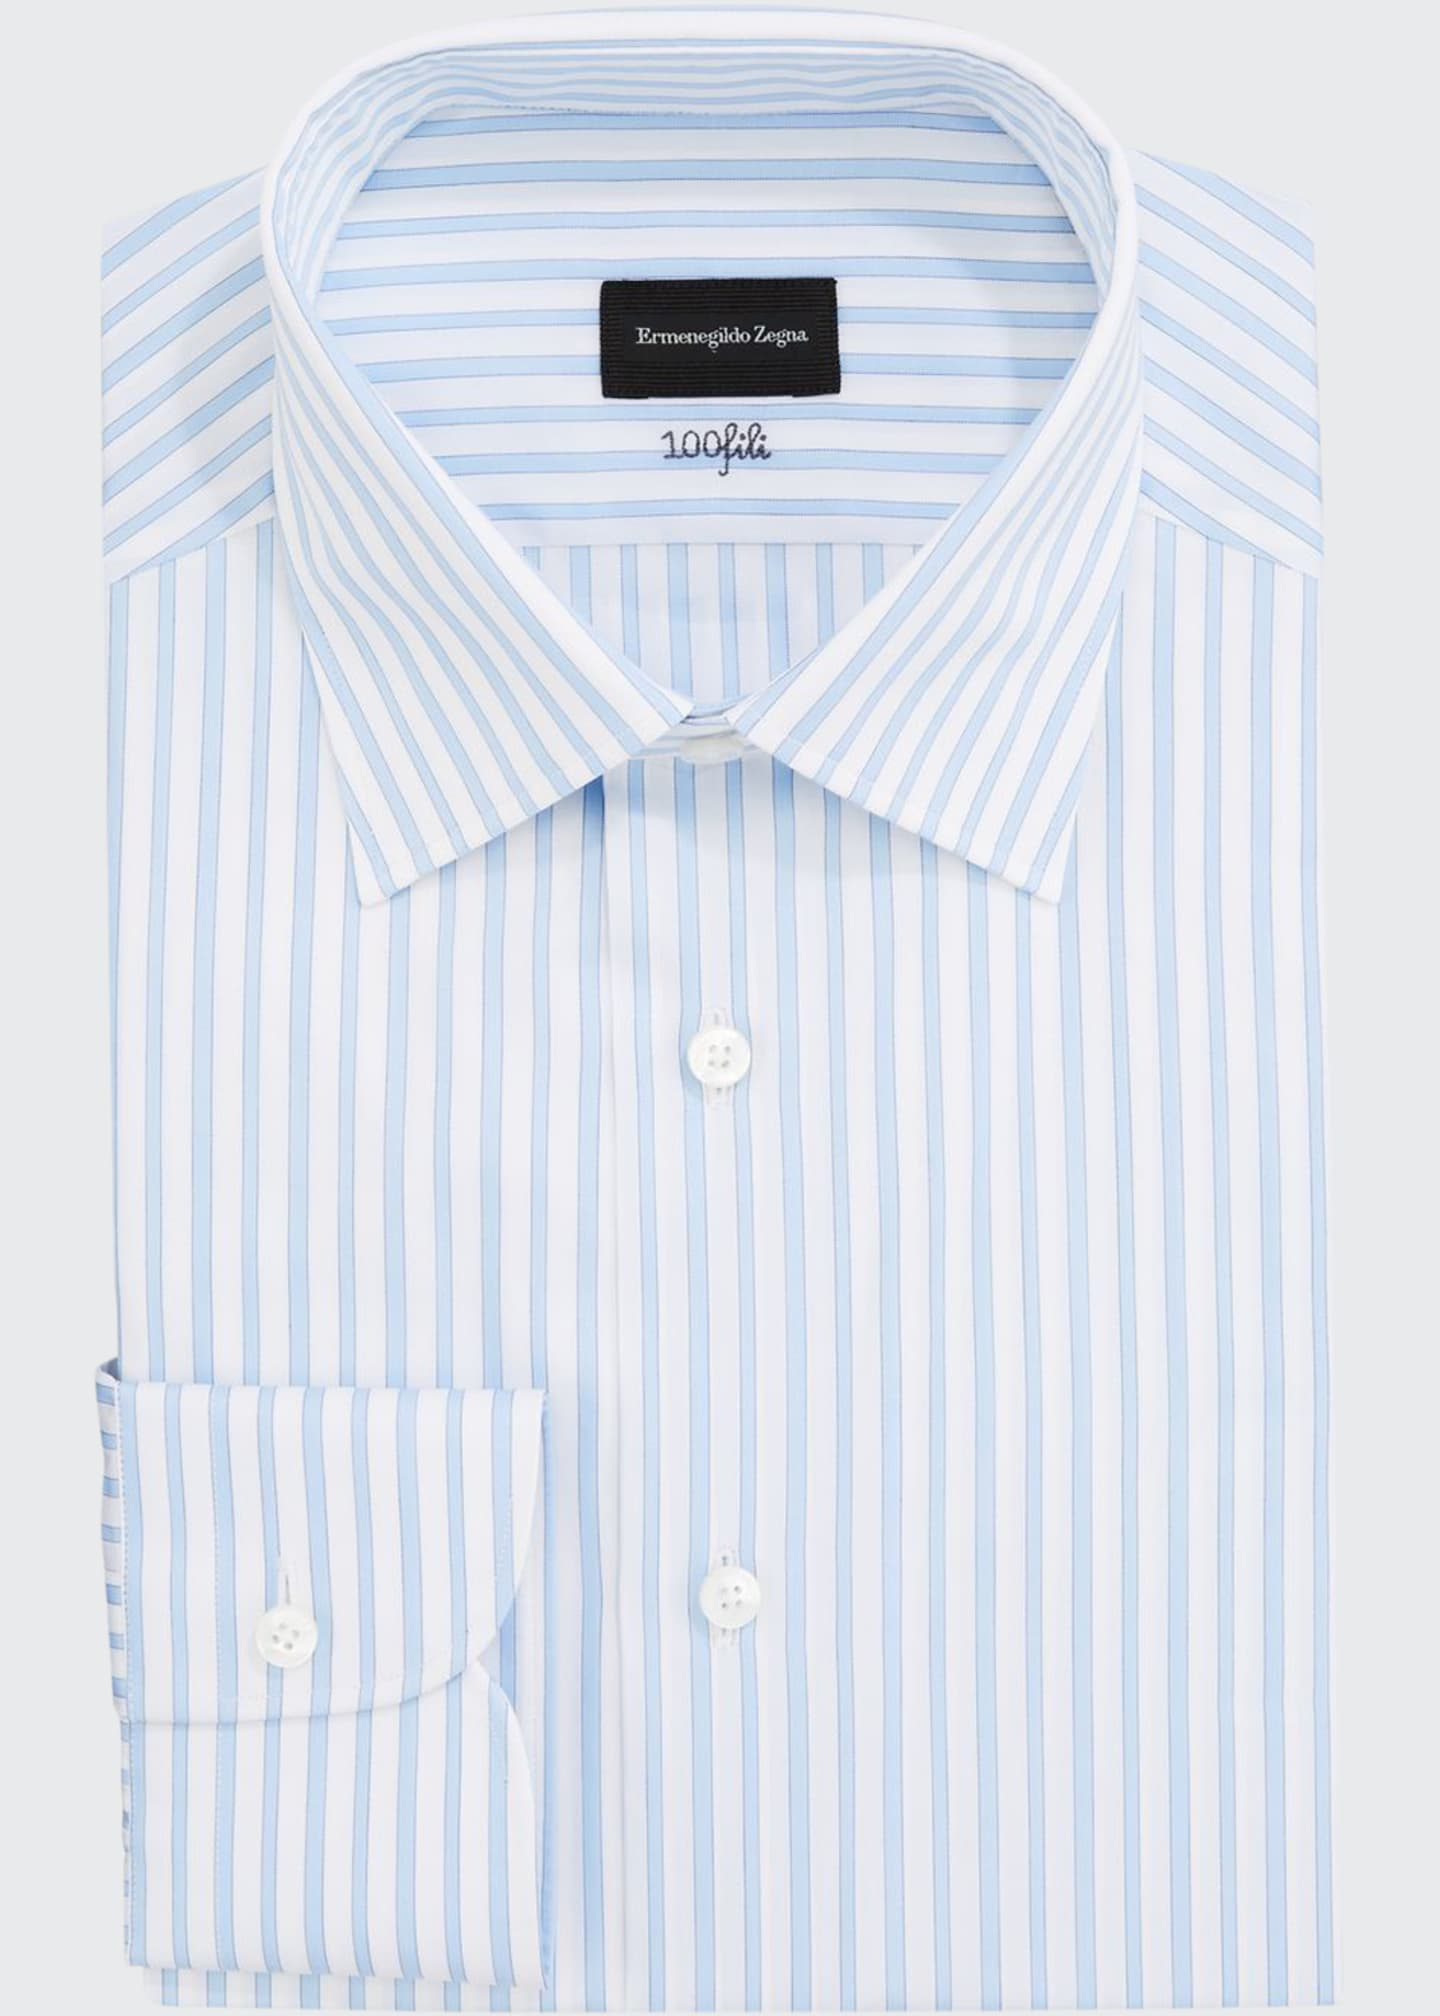 Ermenegildo Zegna Men's Bengal-Stripe Dress Shirt